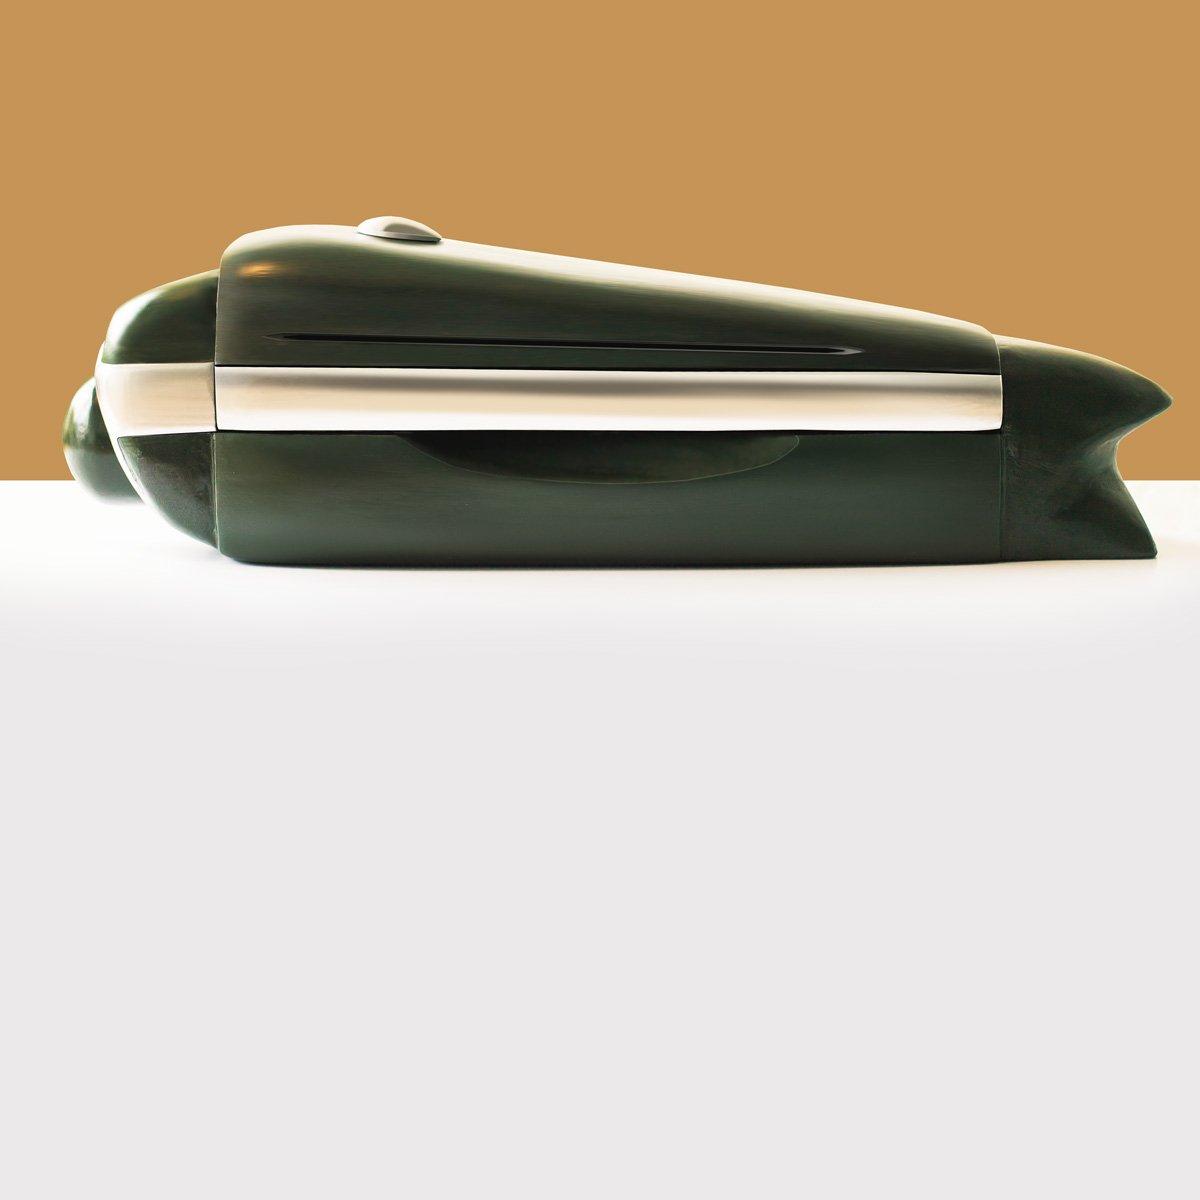 Innovative printer/scanner design inspired by Raymond Loewy